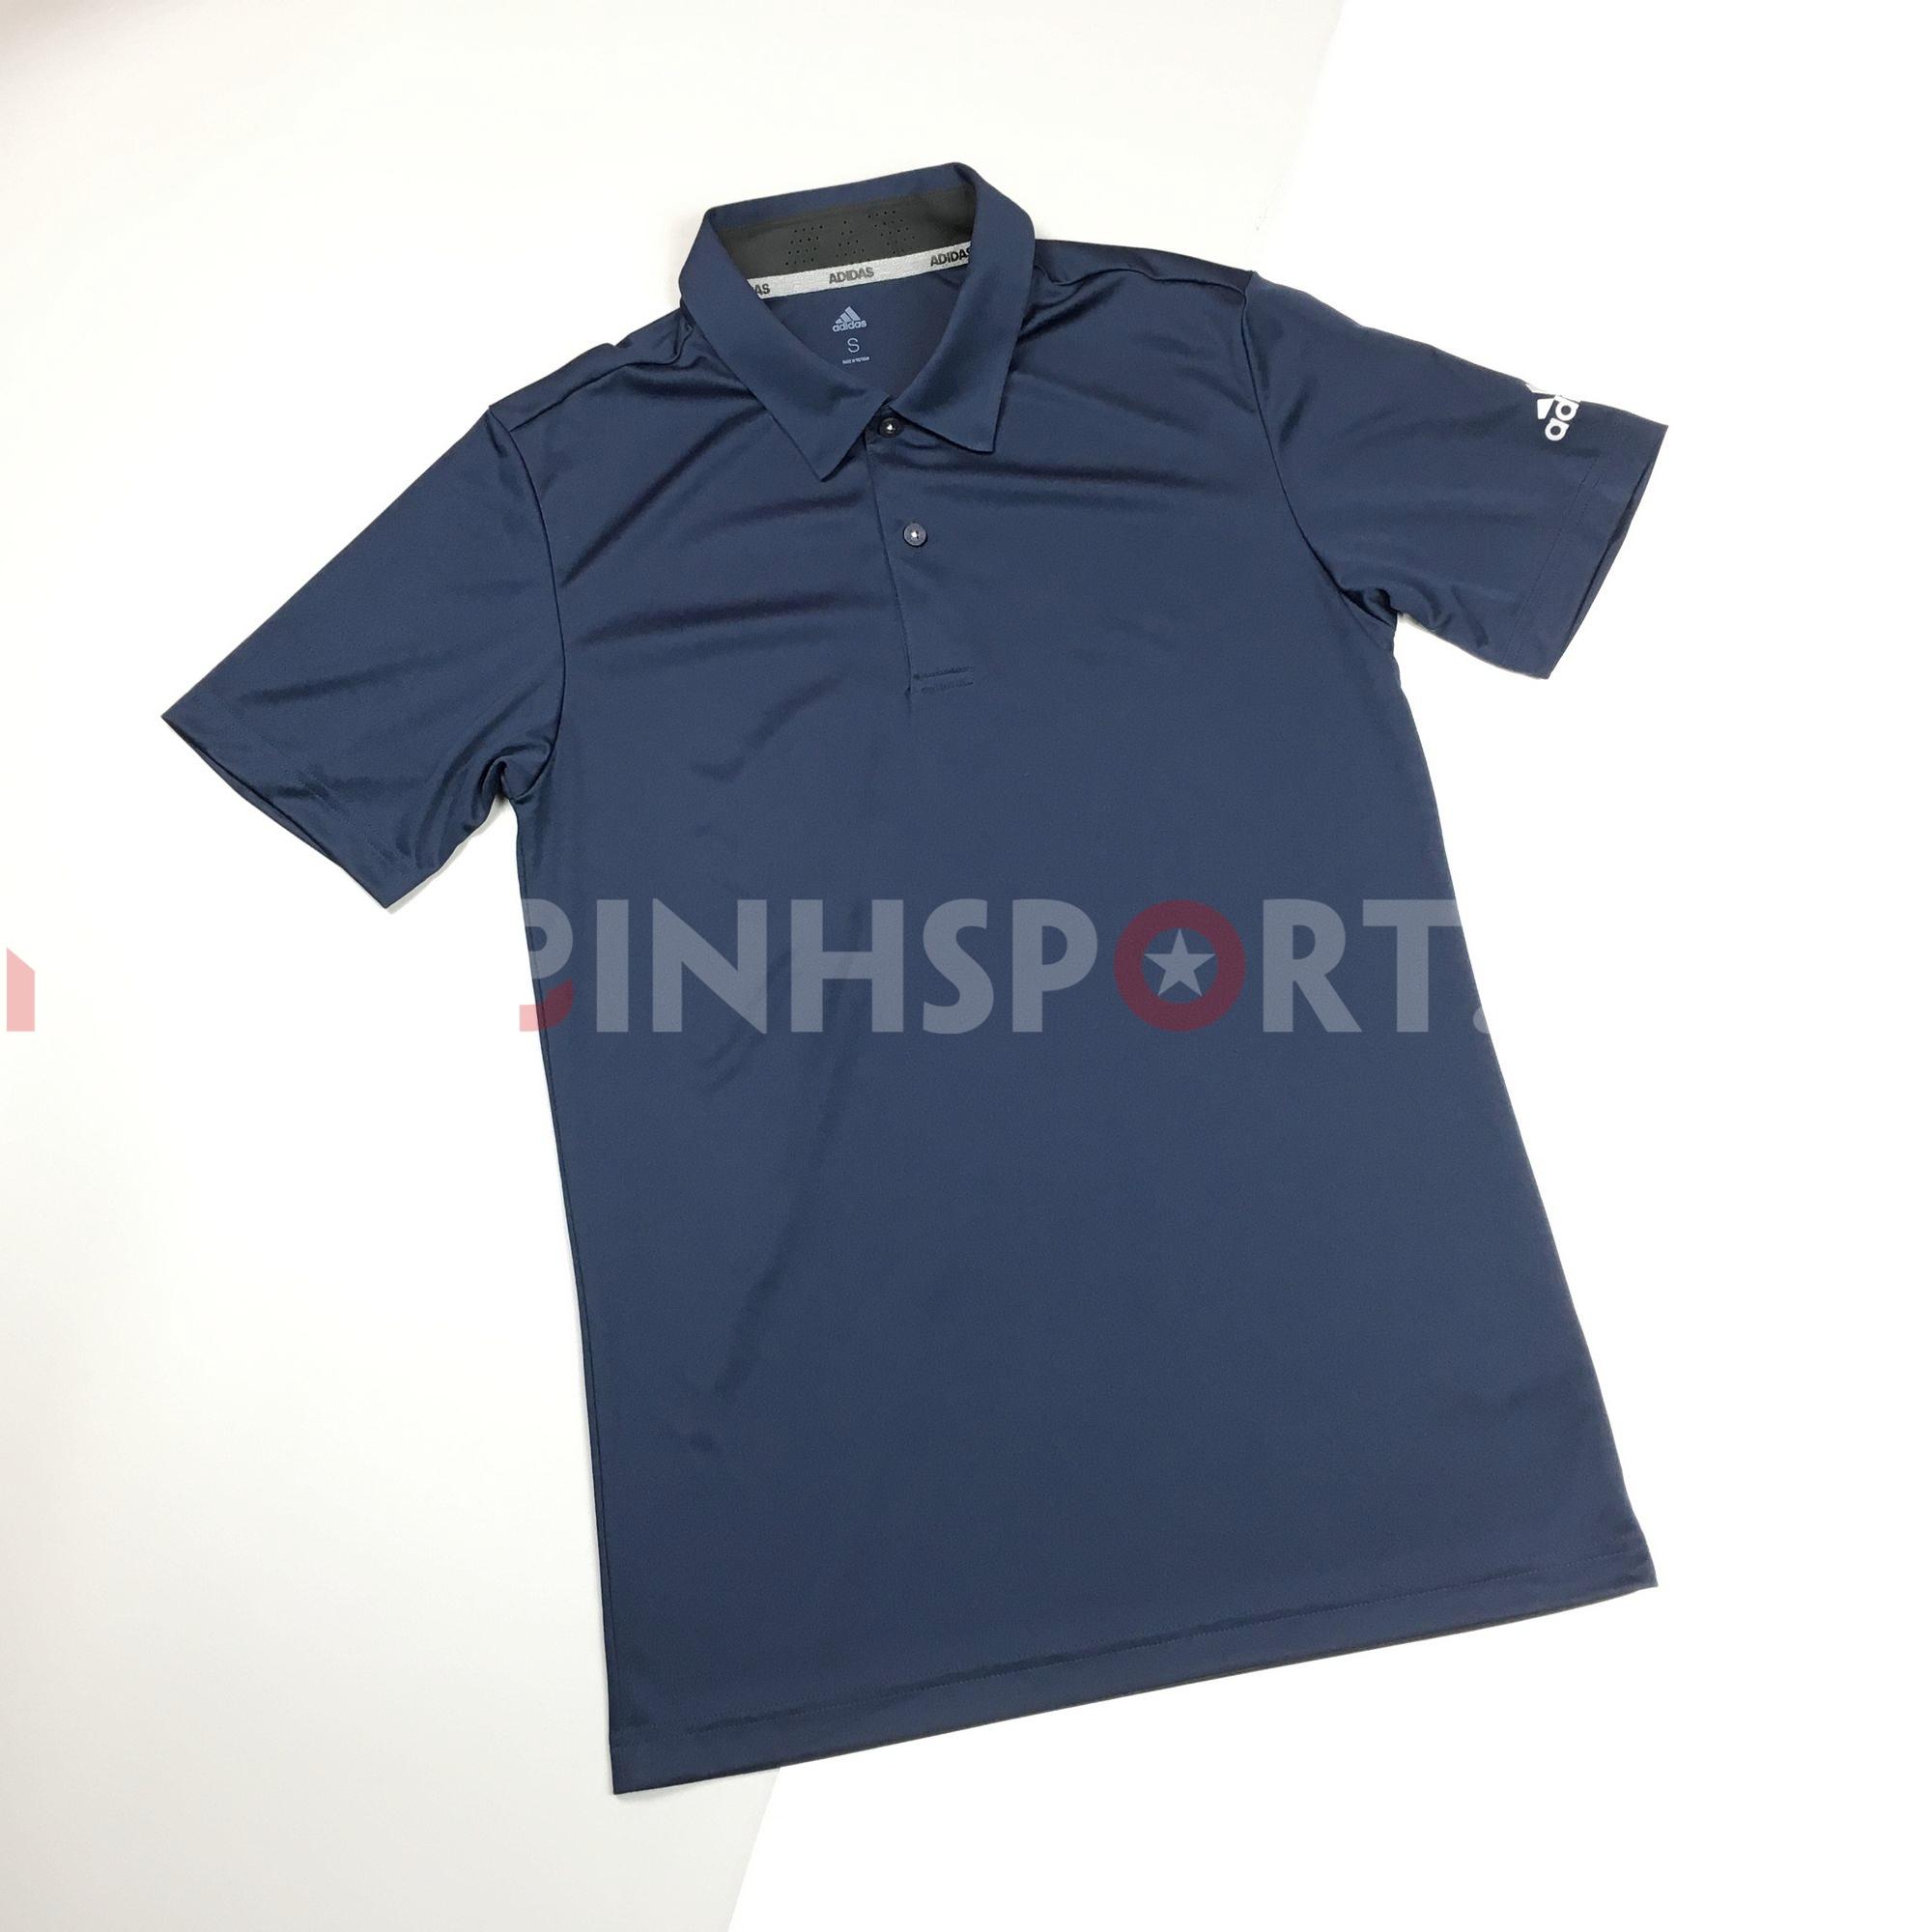 Áo thể thao nam Adidas Golf Polo - Conavy DW5600